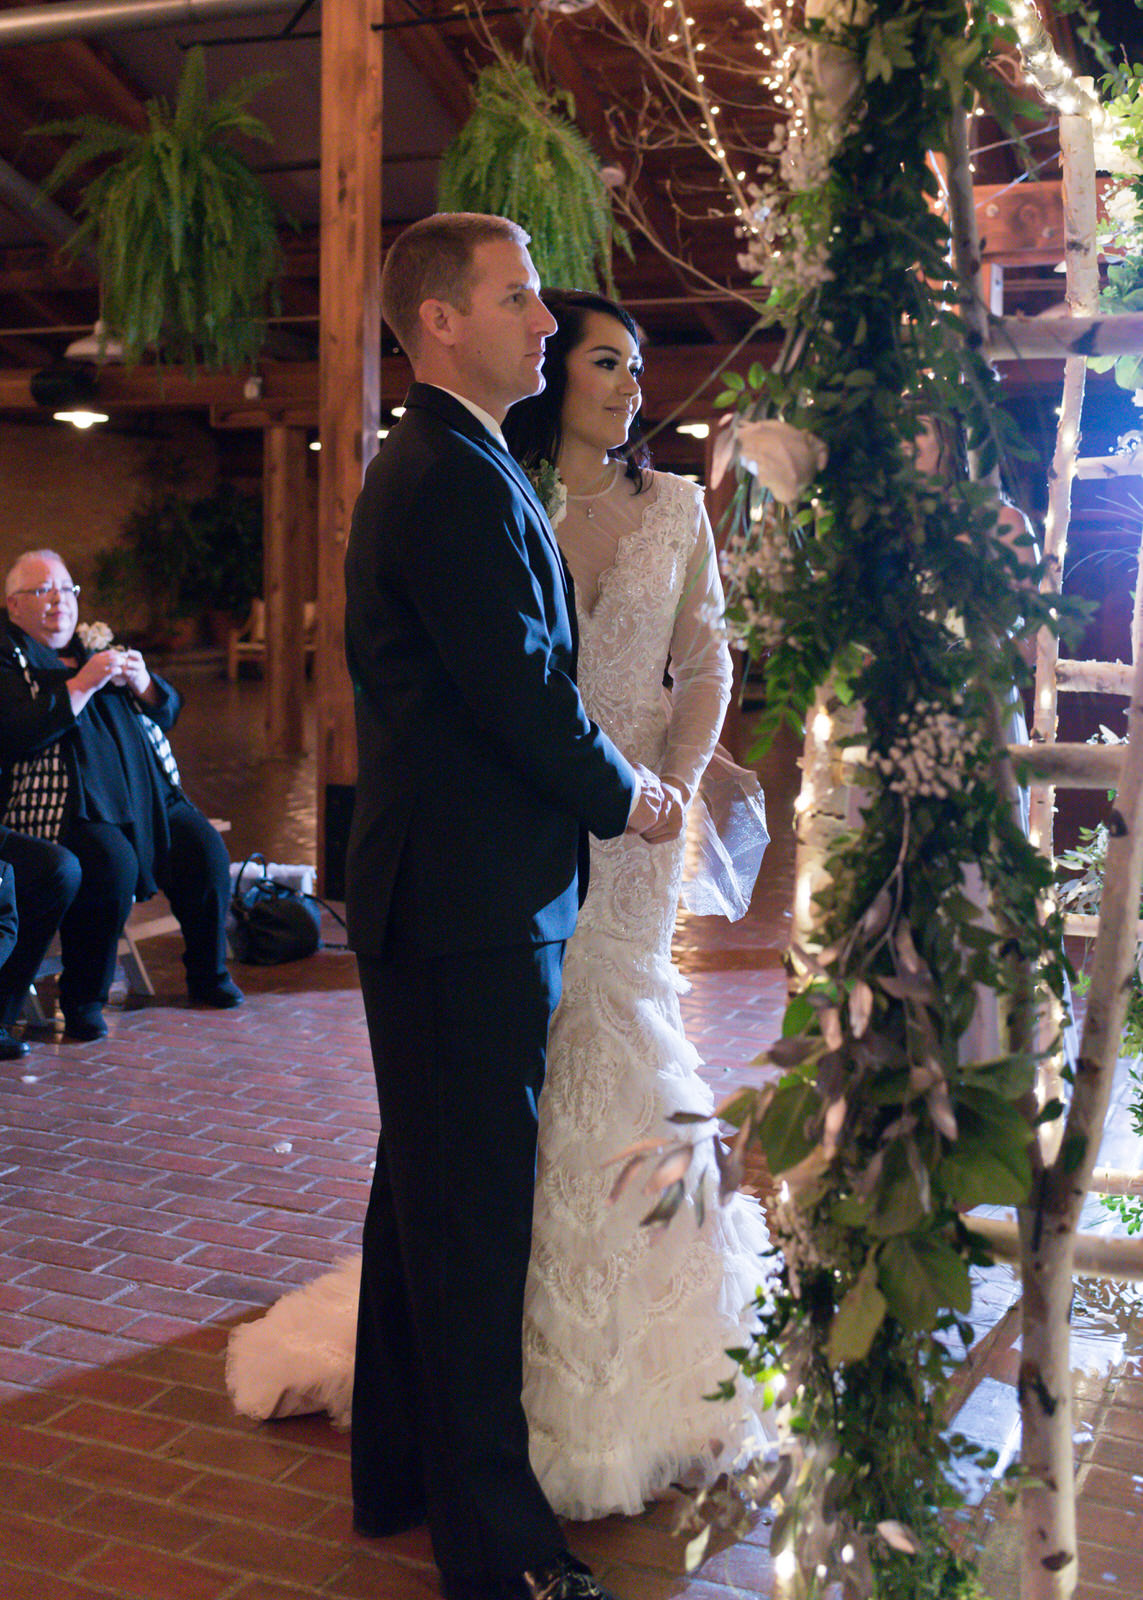 Rustic Winter Wedding Kiana Lodge Poulsbo Rainy Day-33.jpg